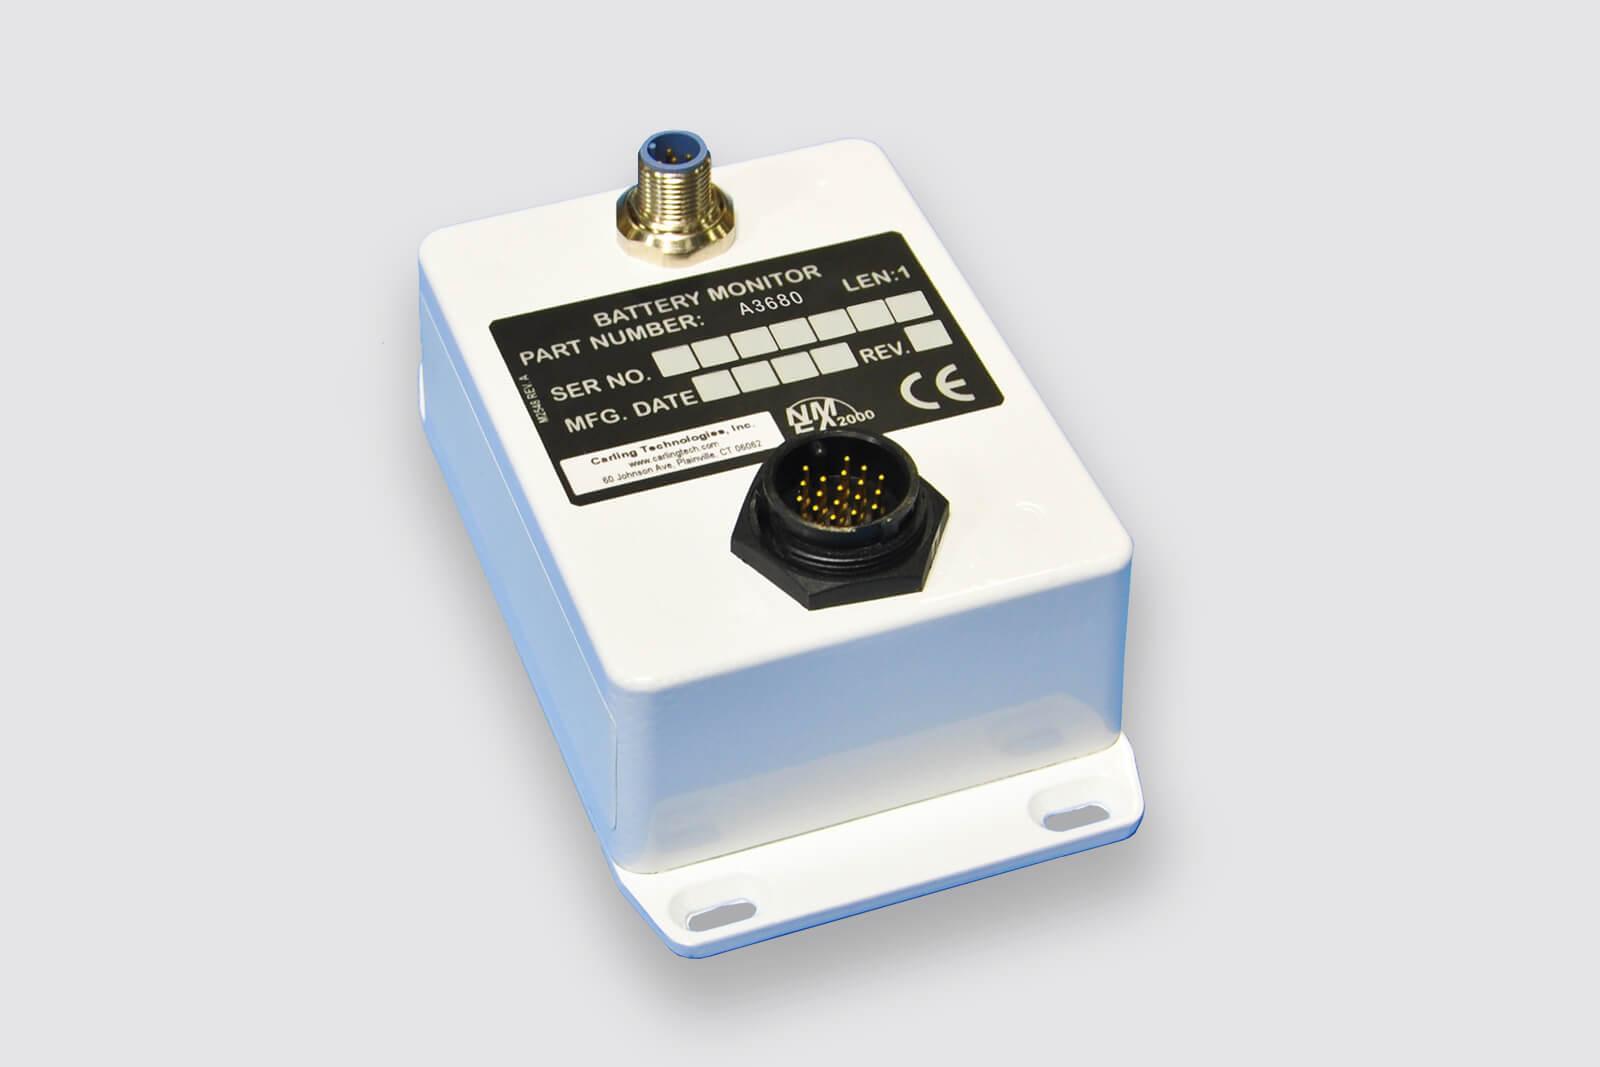 OctoPlex Battery Monitor